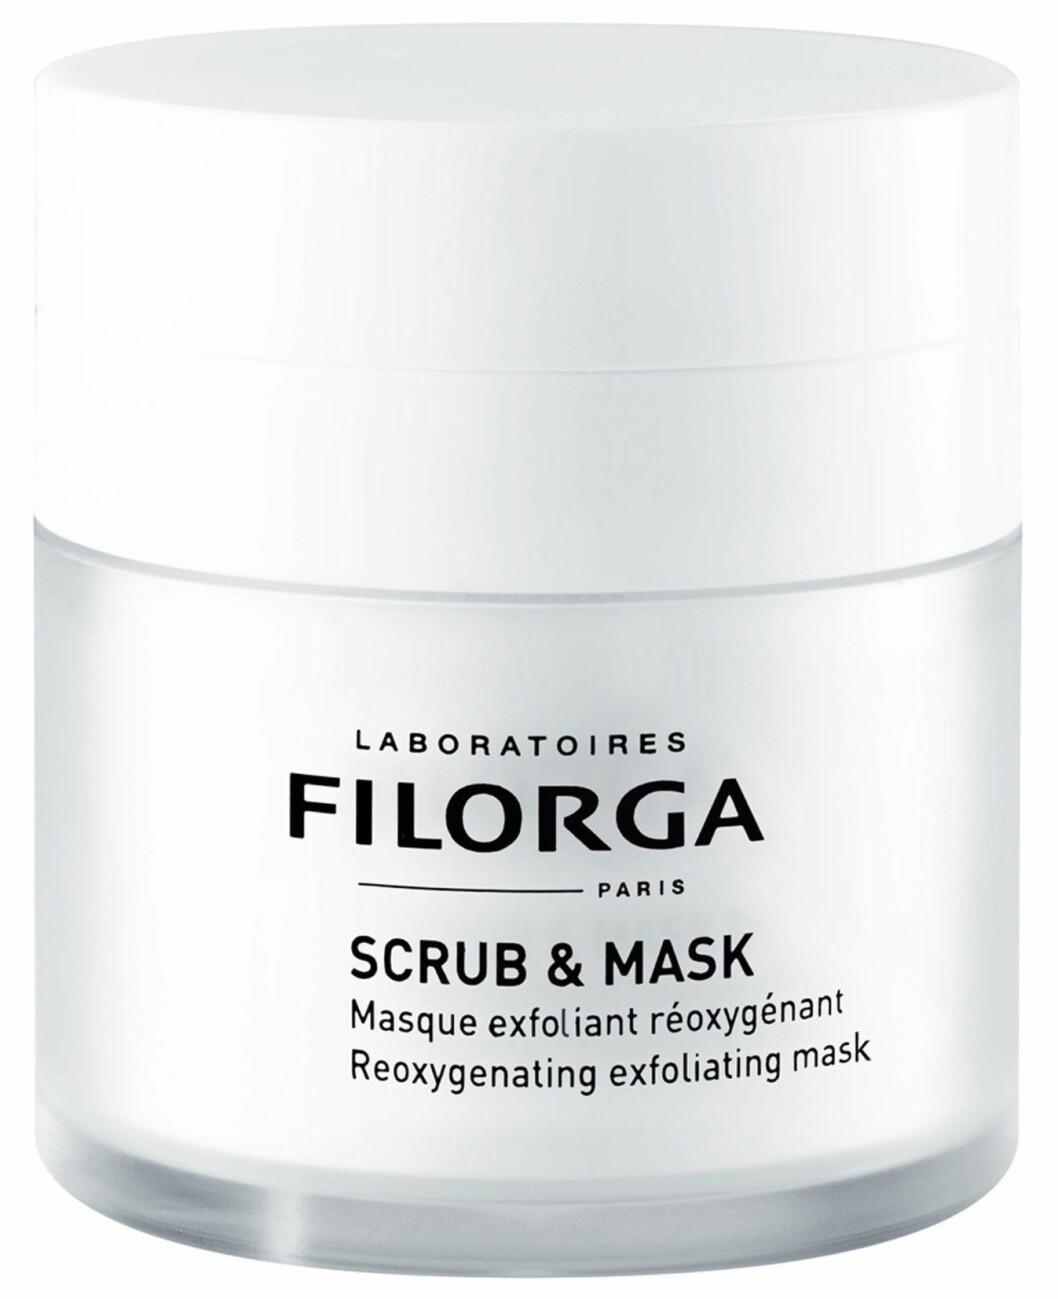 Exfolierande scrub and mask från Filorga.